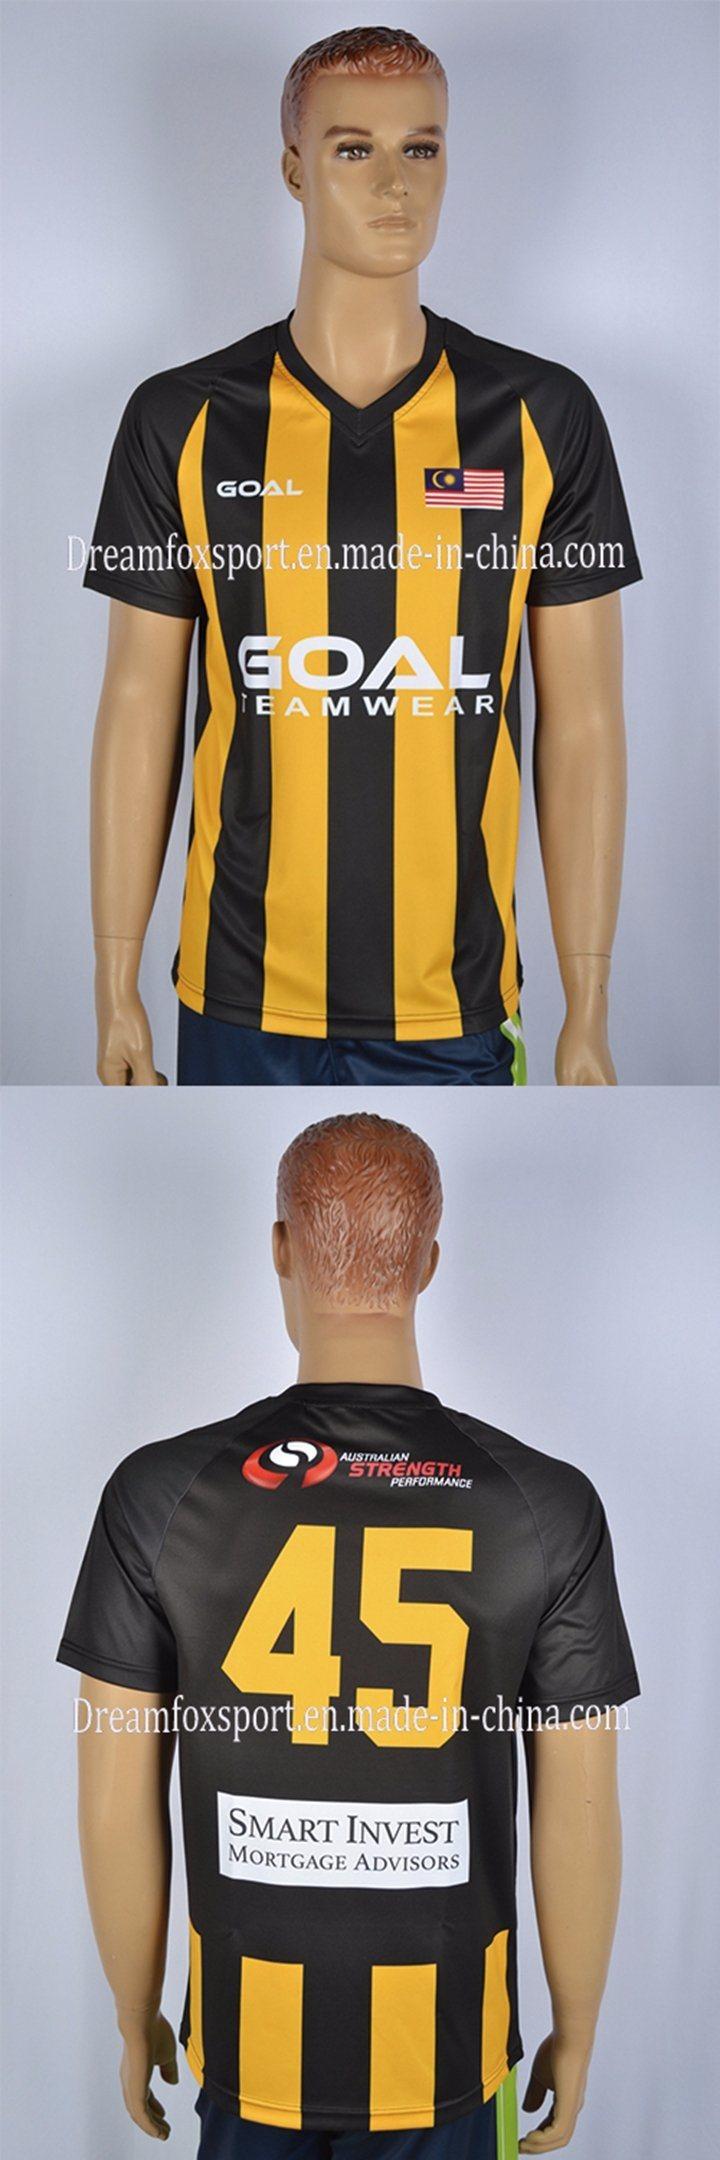 1e14e0837 Custom Soccer Jerseys Mexico